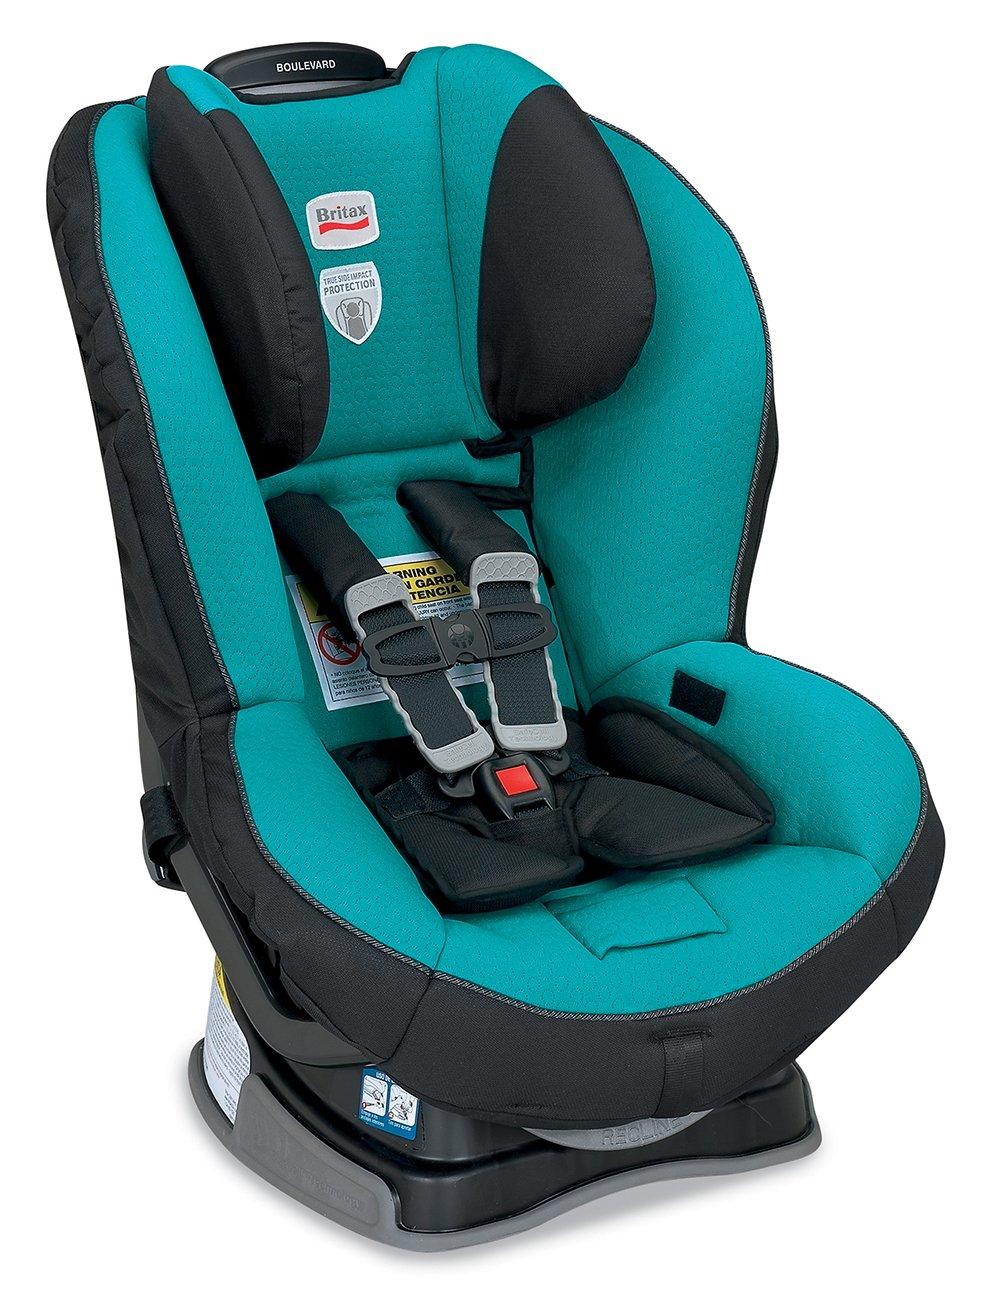 Buy a Britax Car Seat, Get a $...